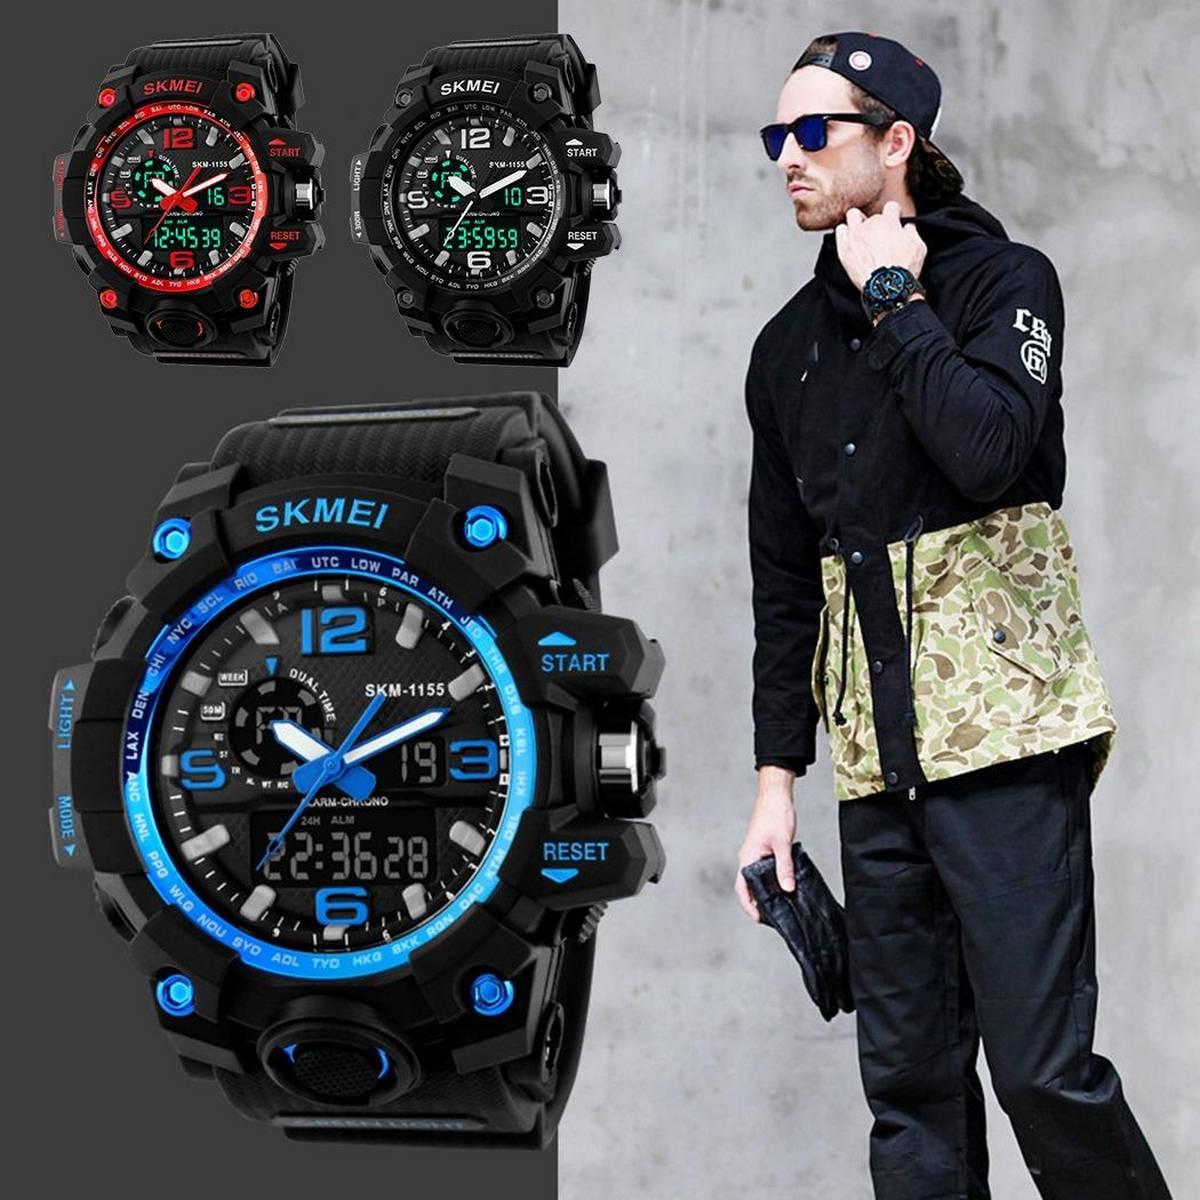 SKMEI 1155 Blue Adult Double Time Watches Wristwatch Dual Display Digital Electronic Watch 50M Waterproof Watch Luminous Sport Watch